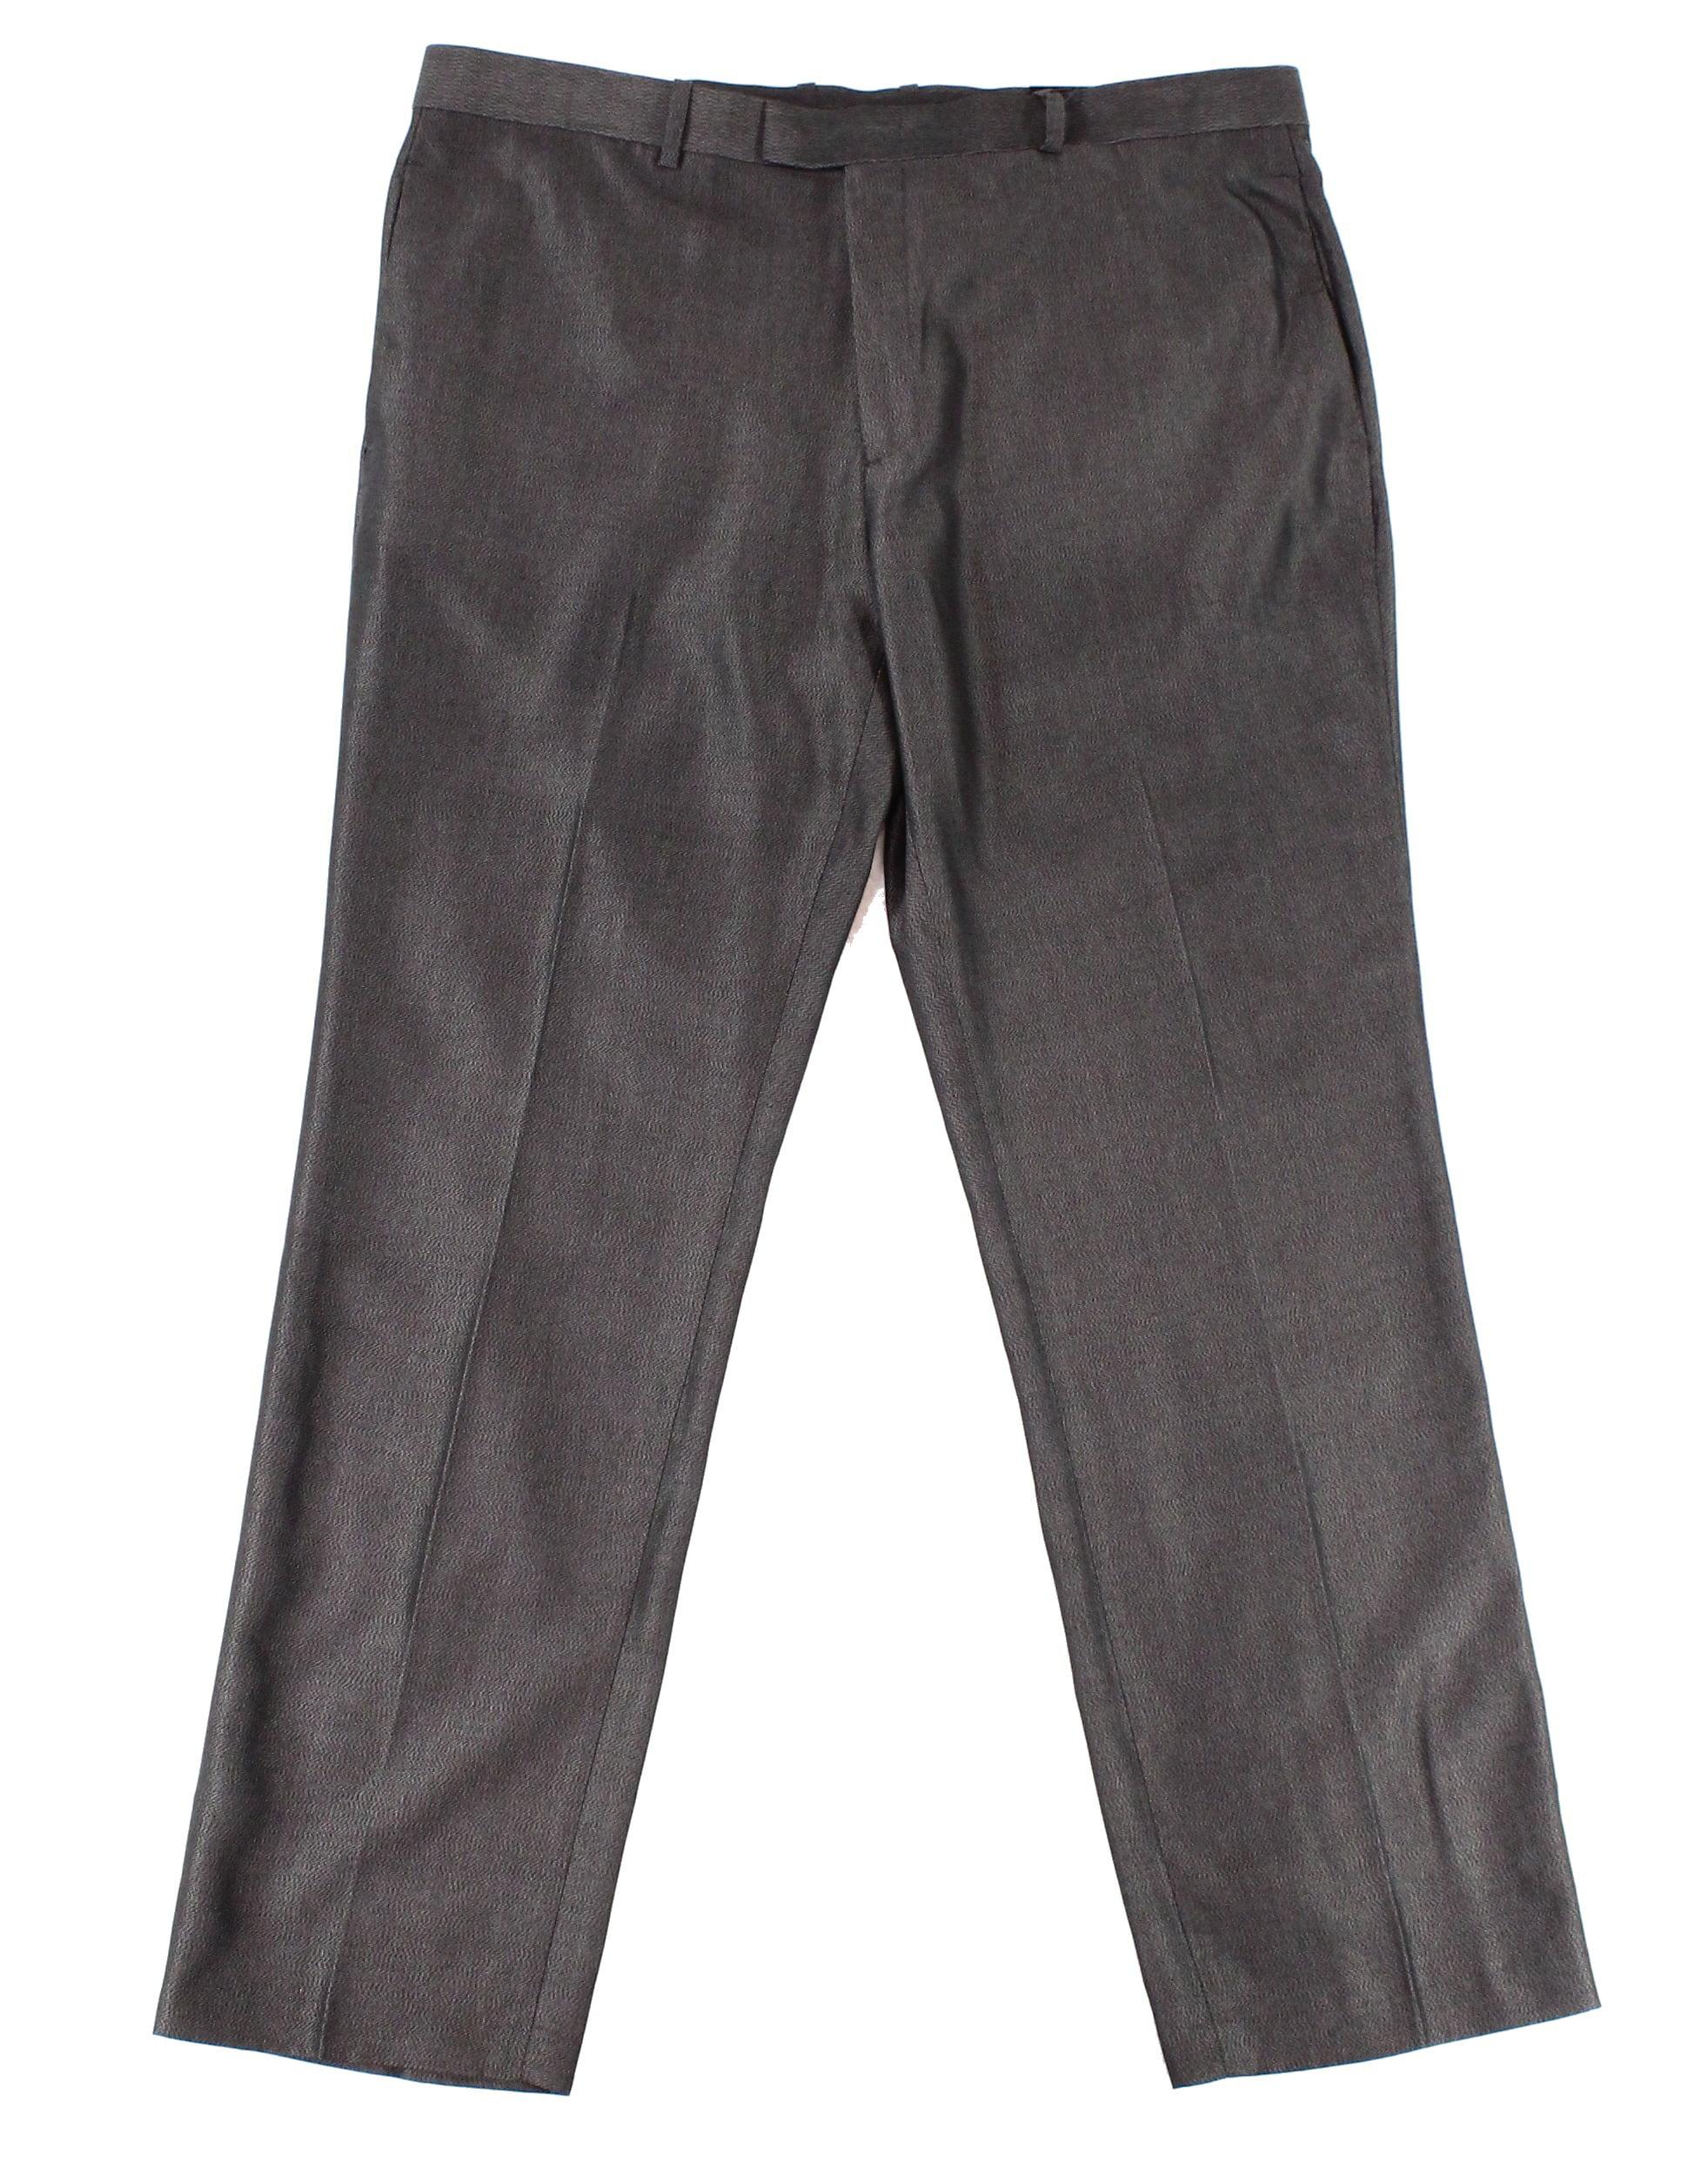 Alfani NEW Deep Gray Mens Size 36x34 Printed Dress Flat Front Pants